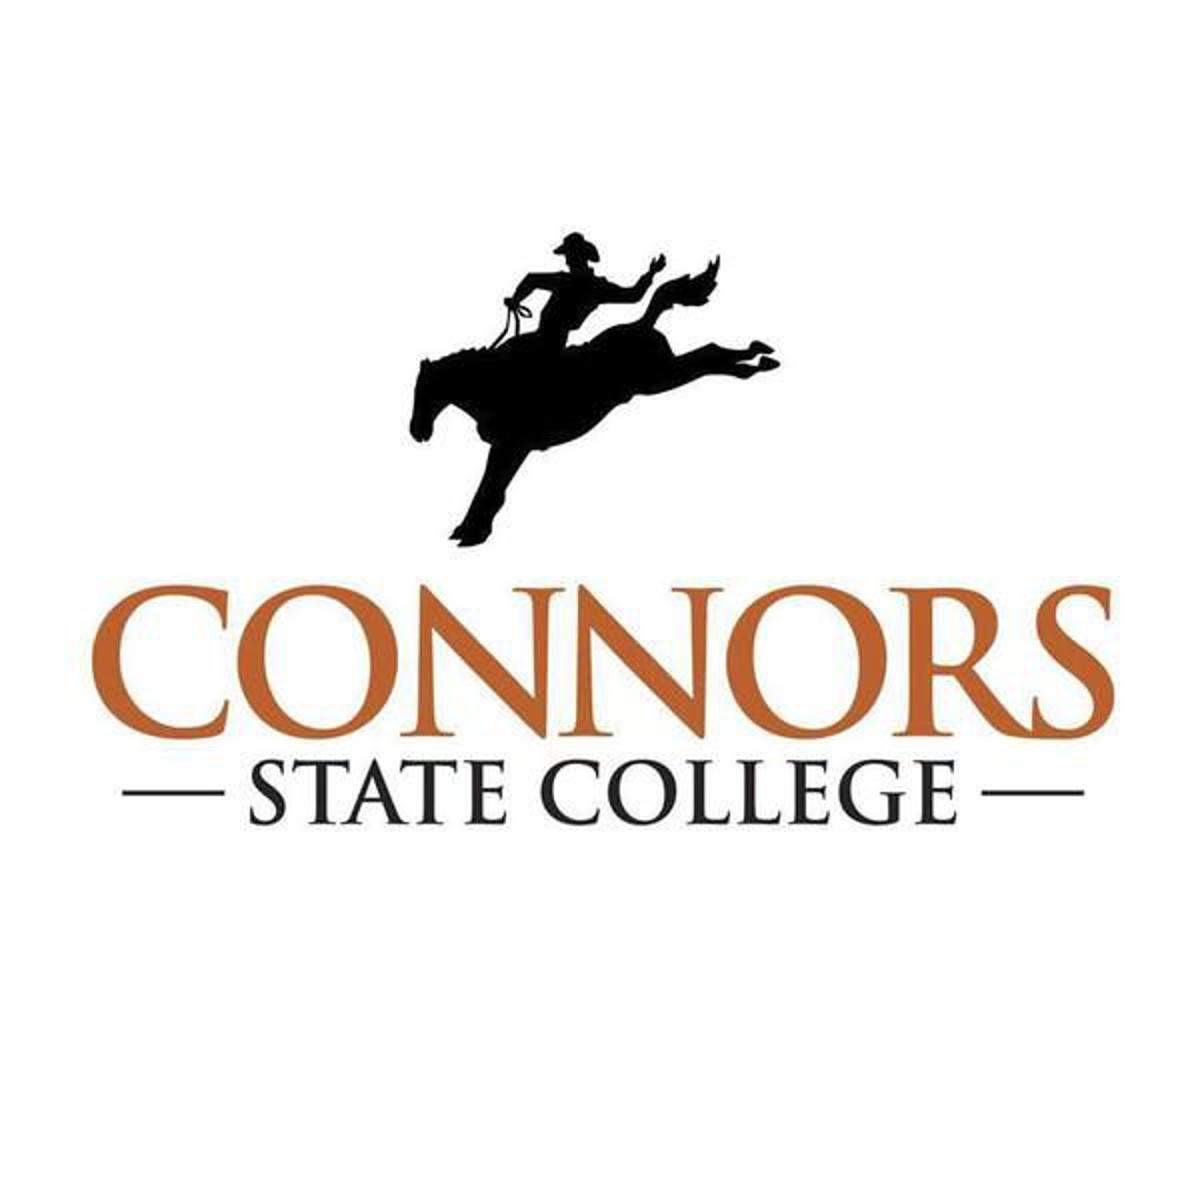 Connors pins 42 new nurses | Lifestyles | muskogeephoenix com